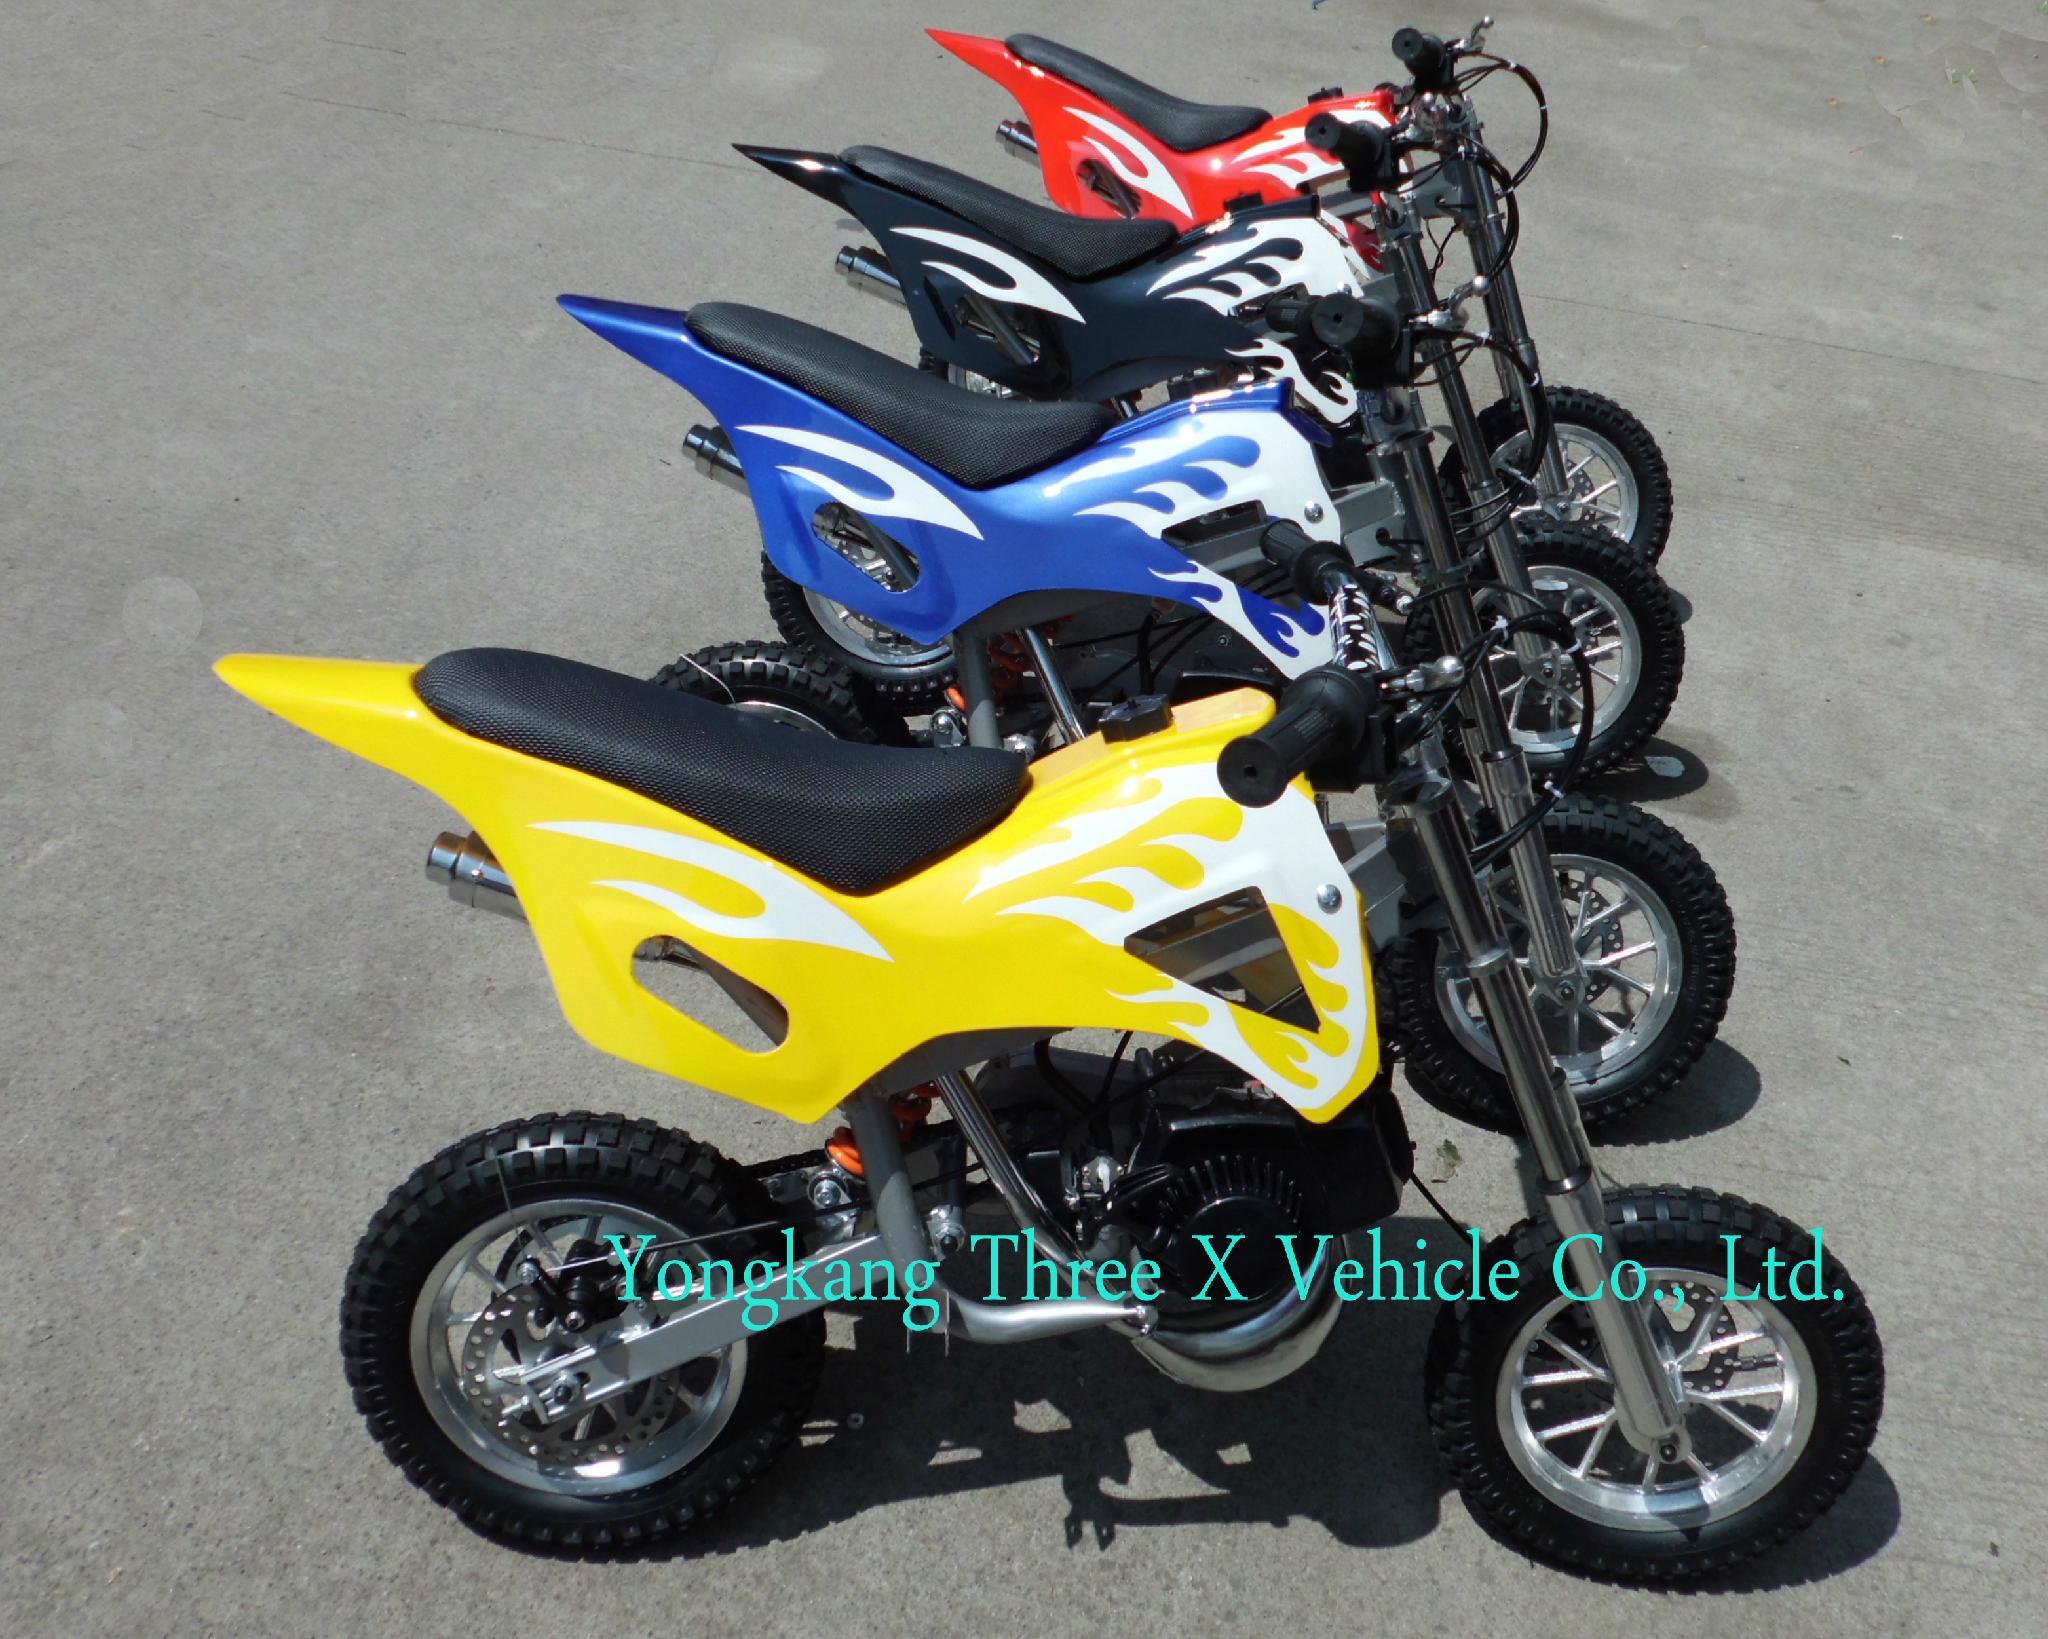 49cc mini dirt bike tx db01 tx china manufacturer. Black Bedroom Furniture Sets. Home Design Ideas